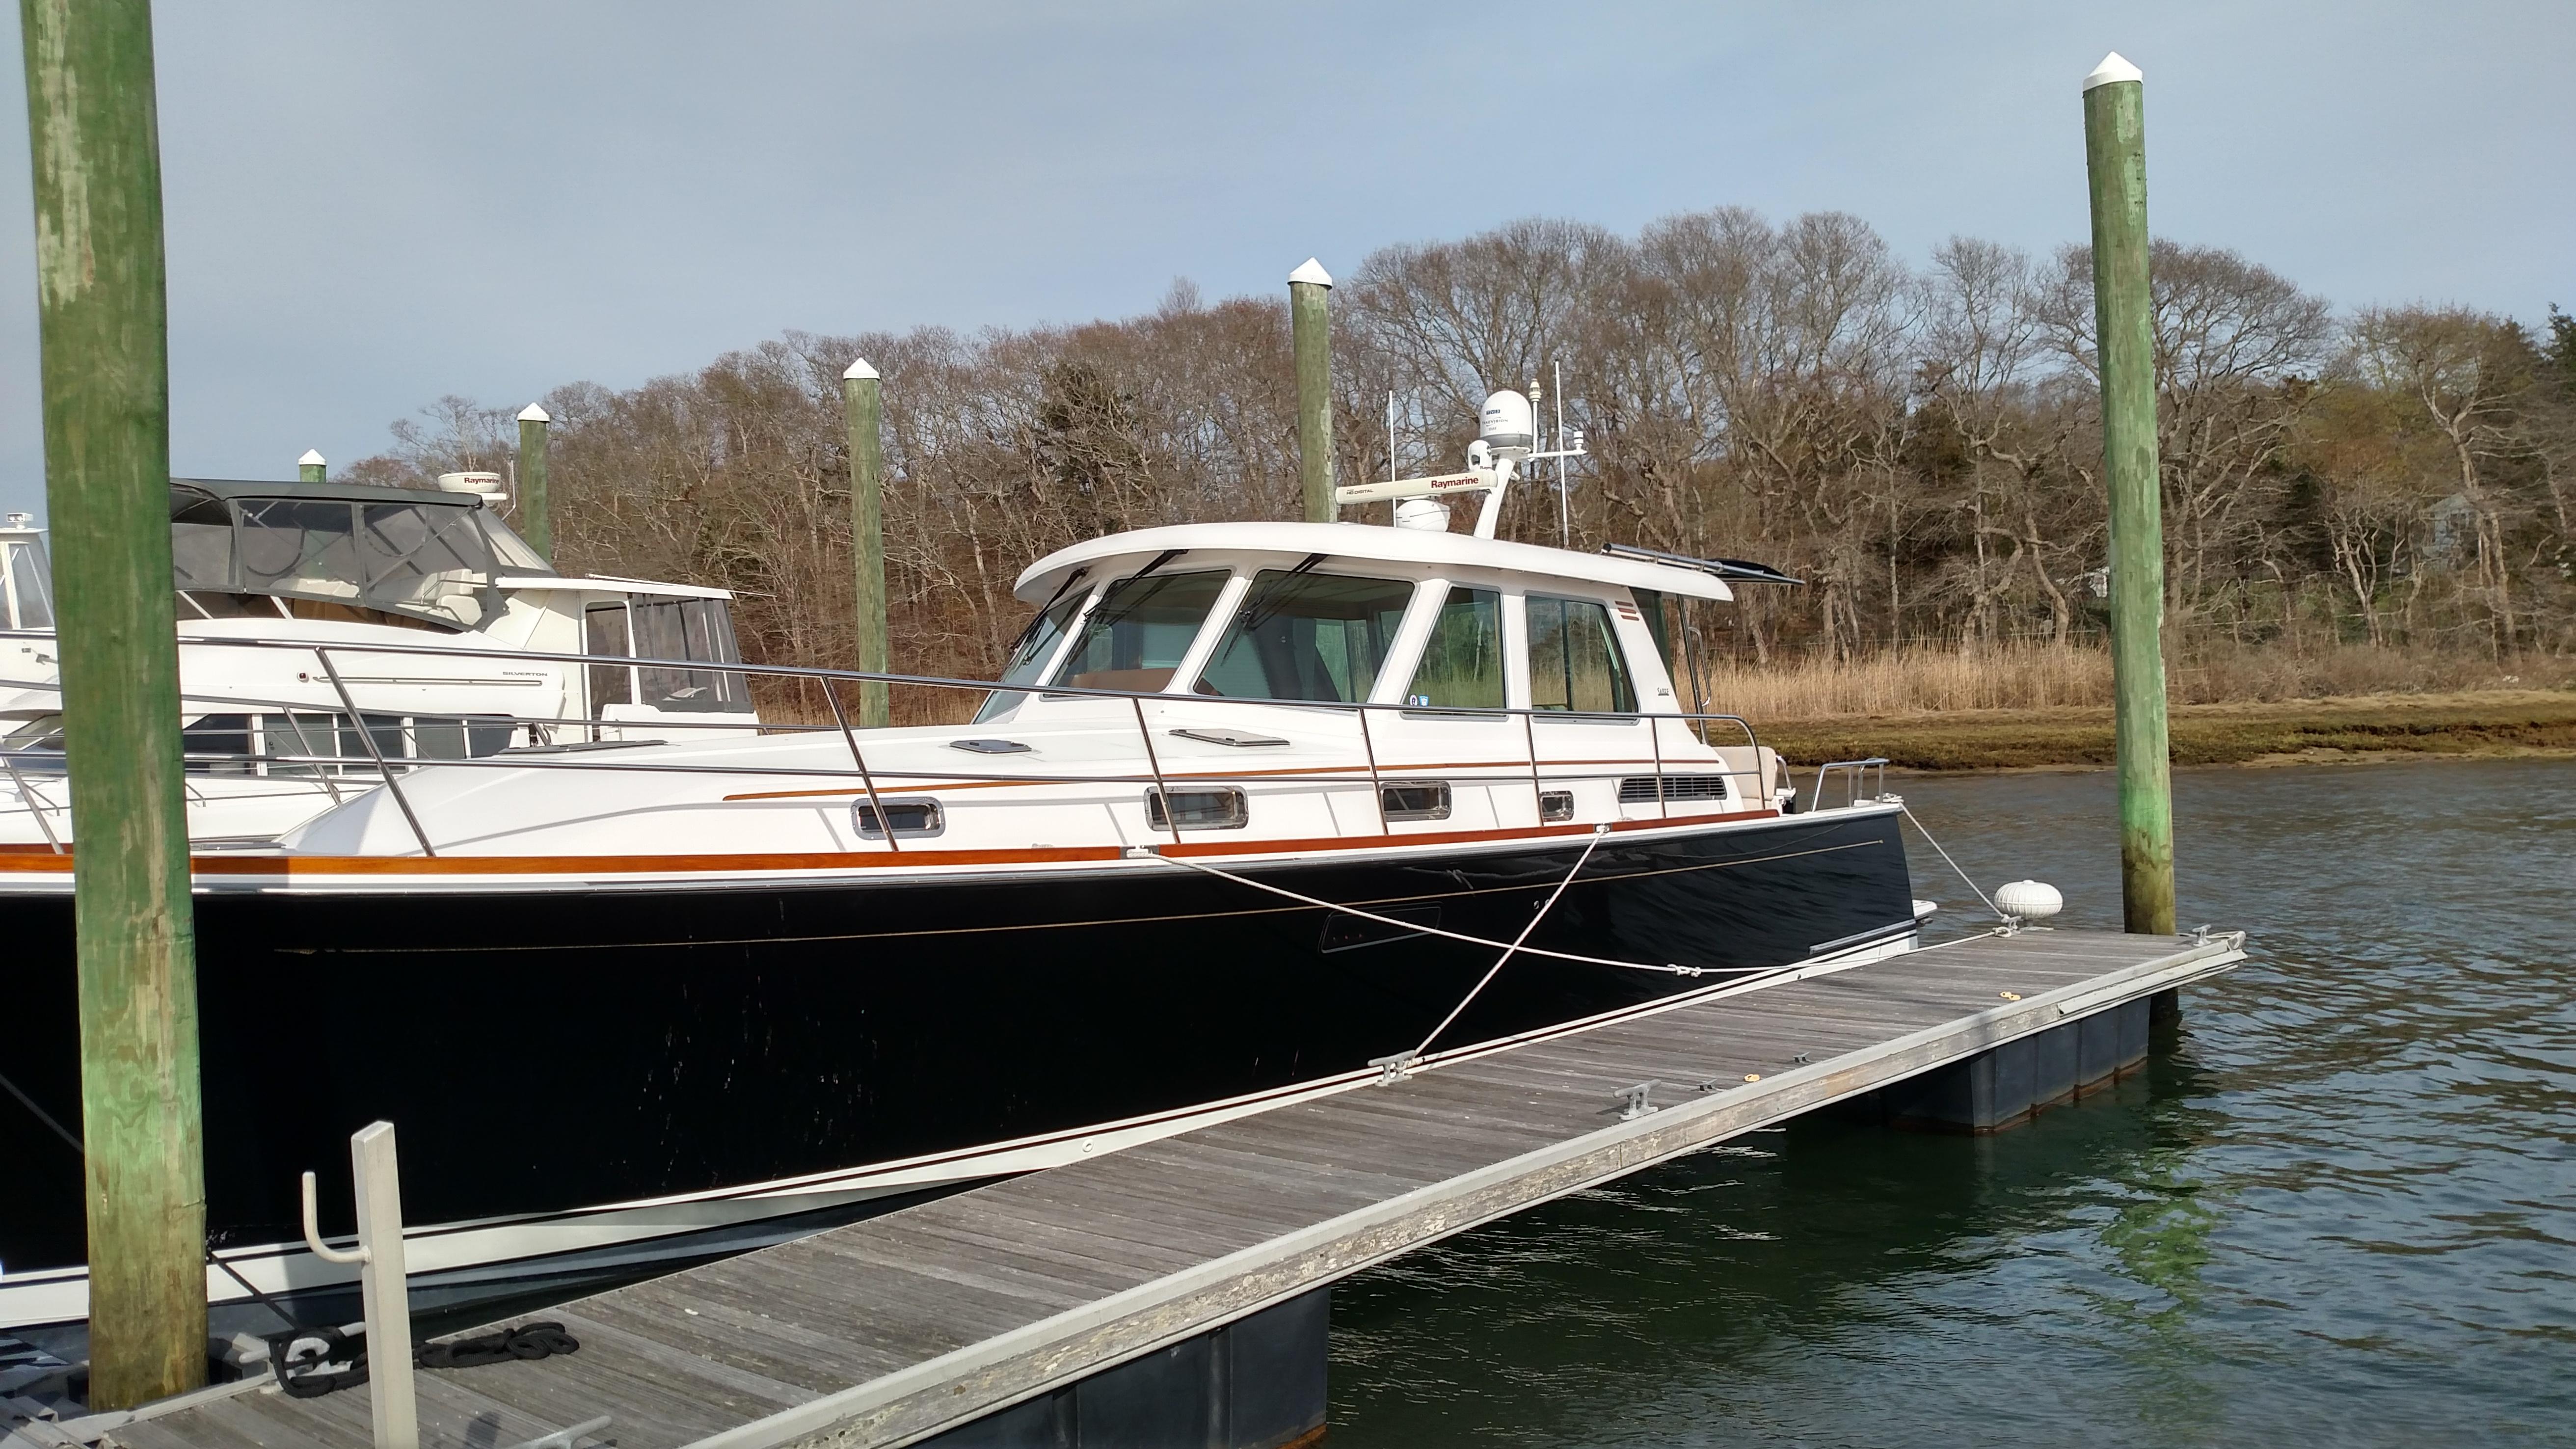 Yacht for Sale: 48' Sabre Salon Express 2012